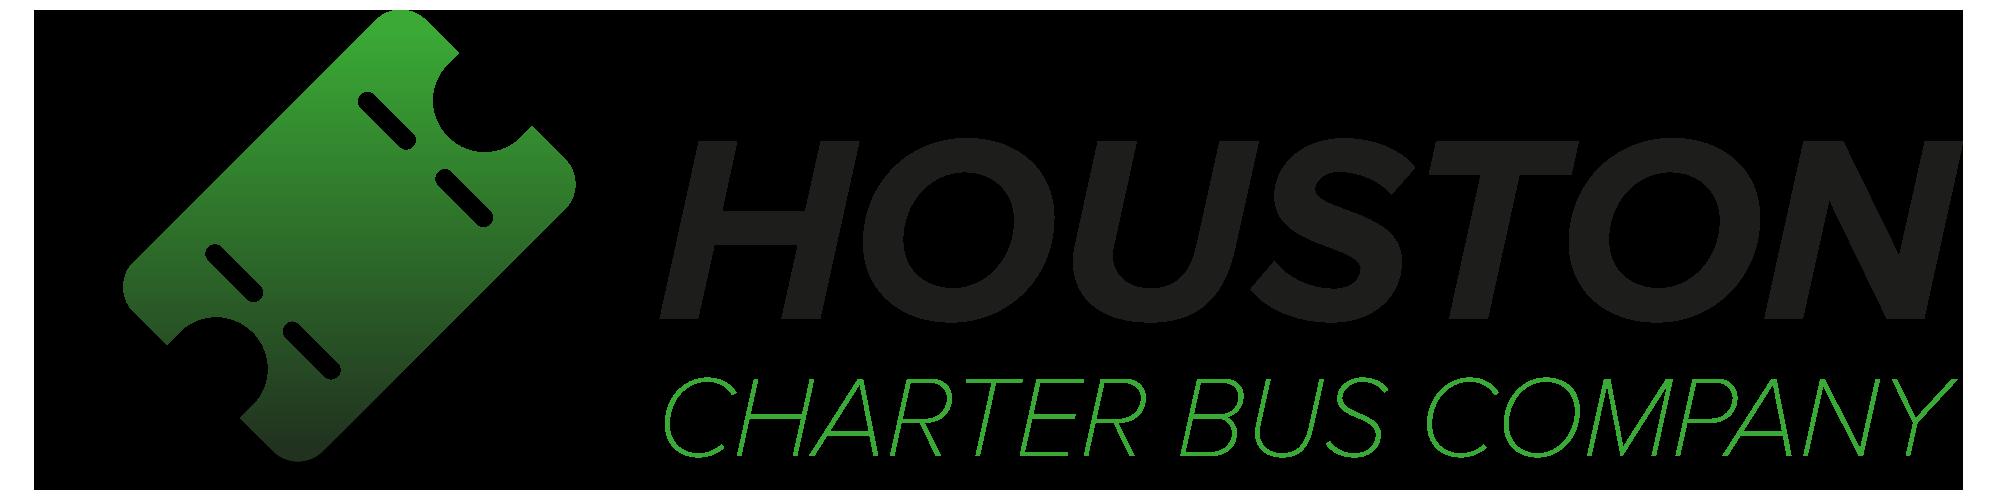 Texas charter bus company